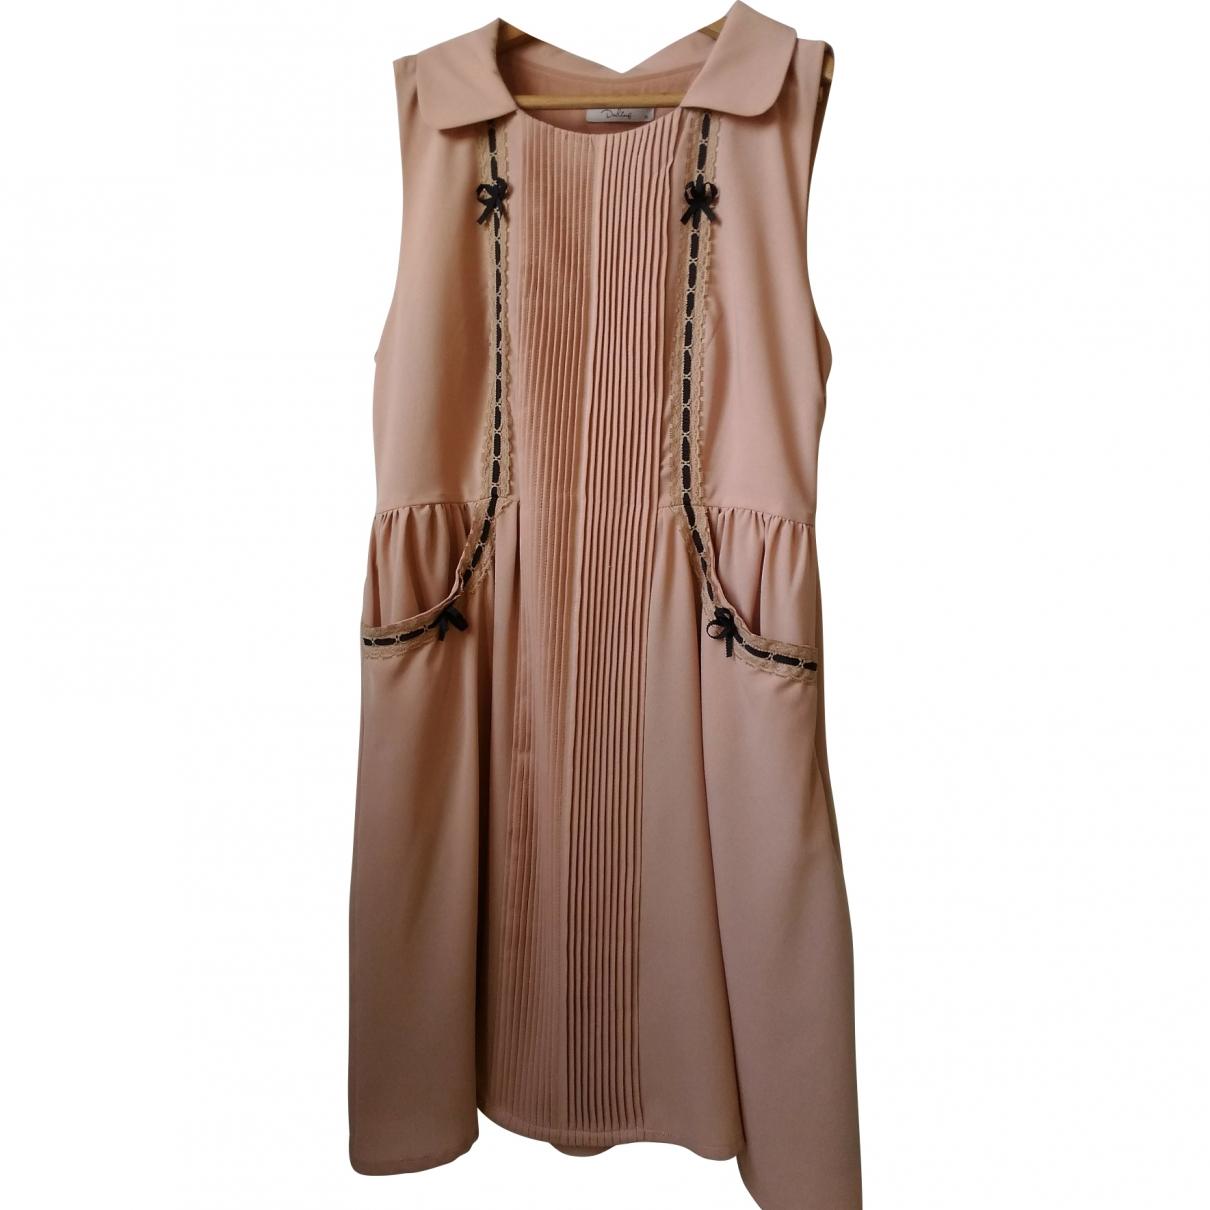 Darling \N Pink dress for Women M International